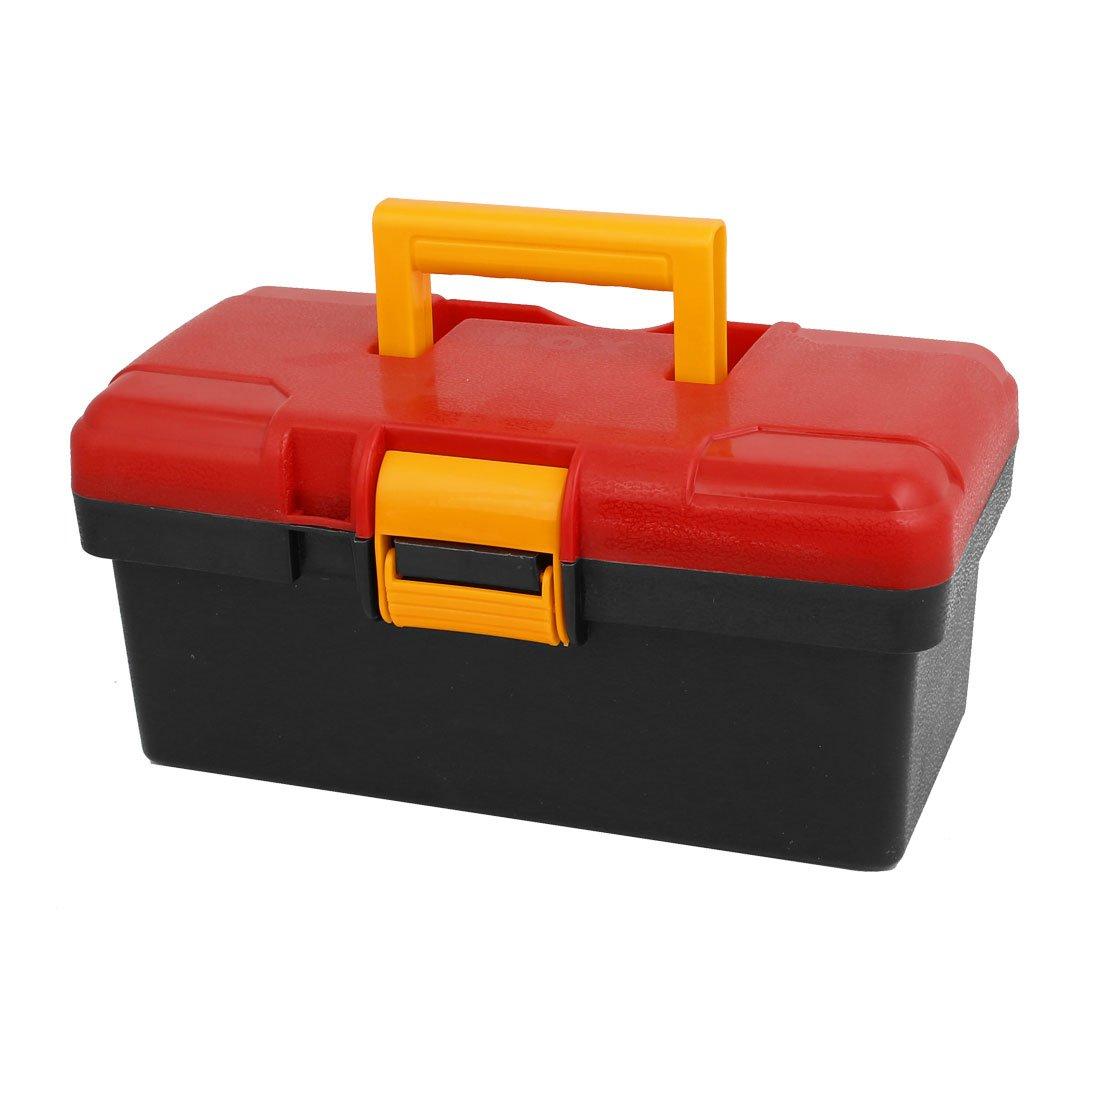 uxcell Universal Auto Car Truck Tool Storage Box Organizer Case Dual Layers Black